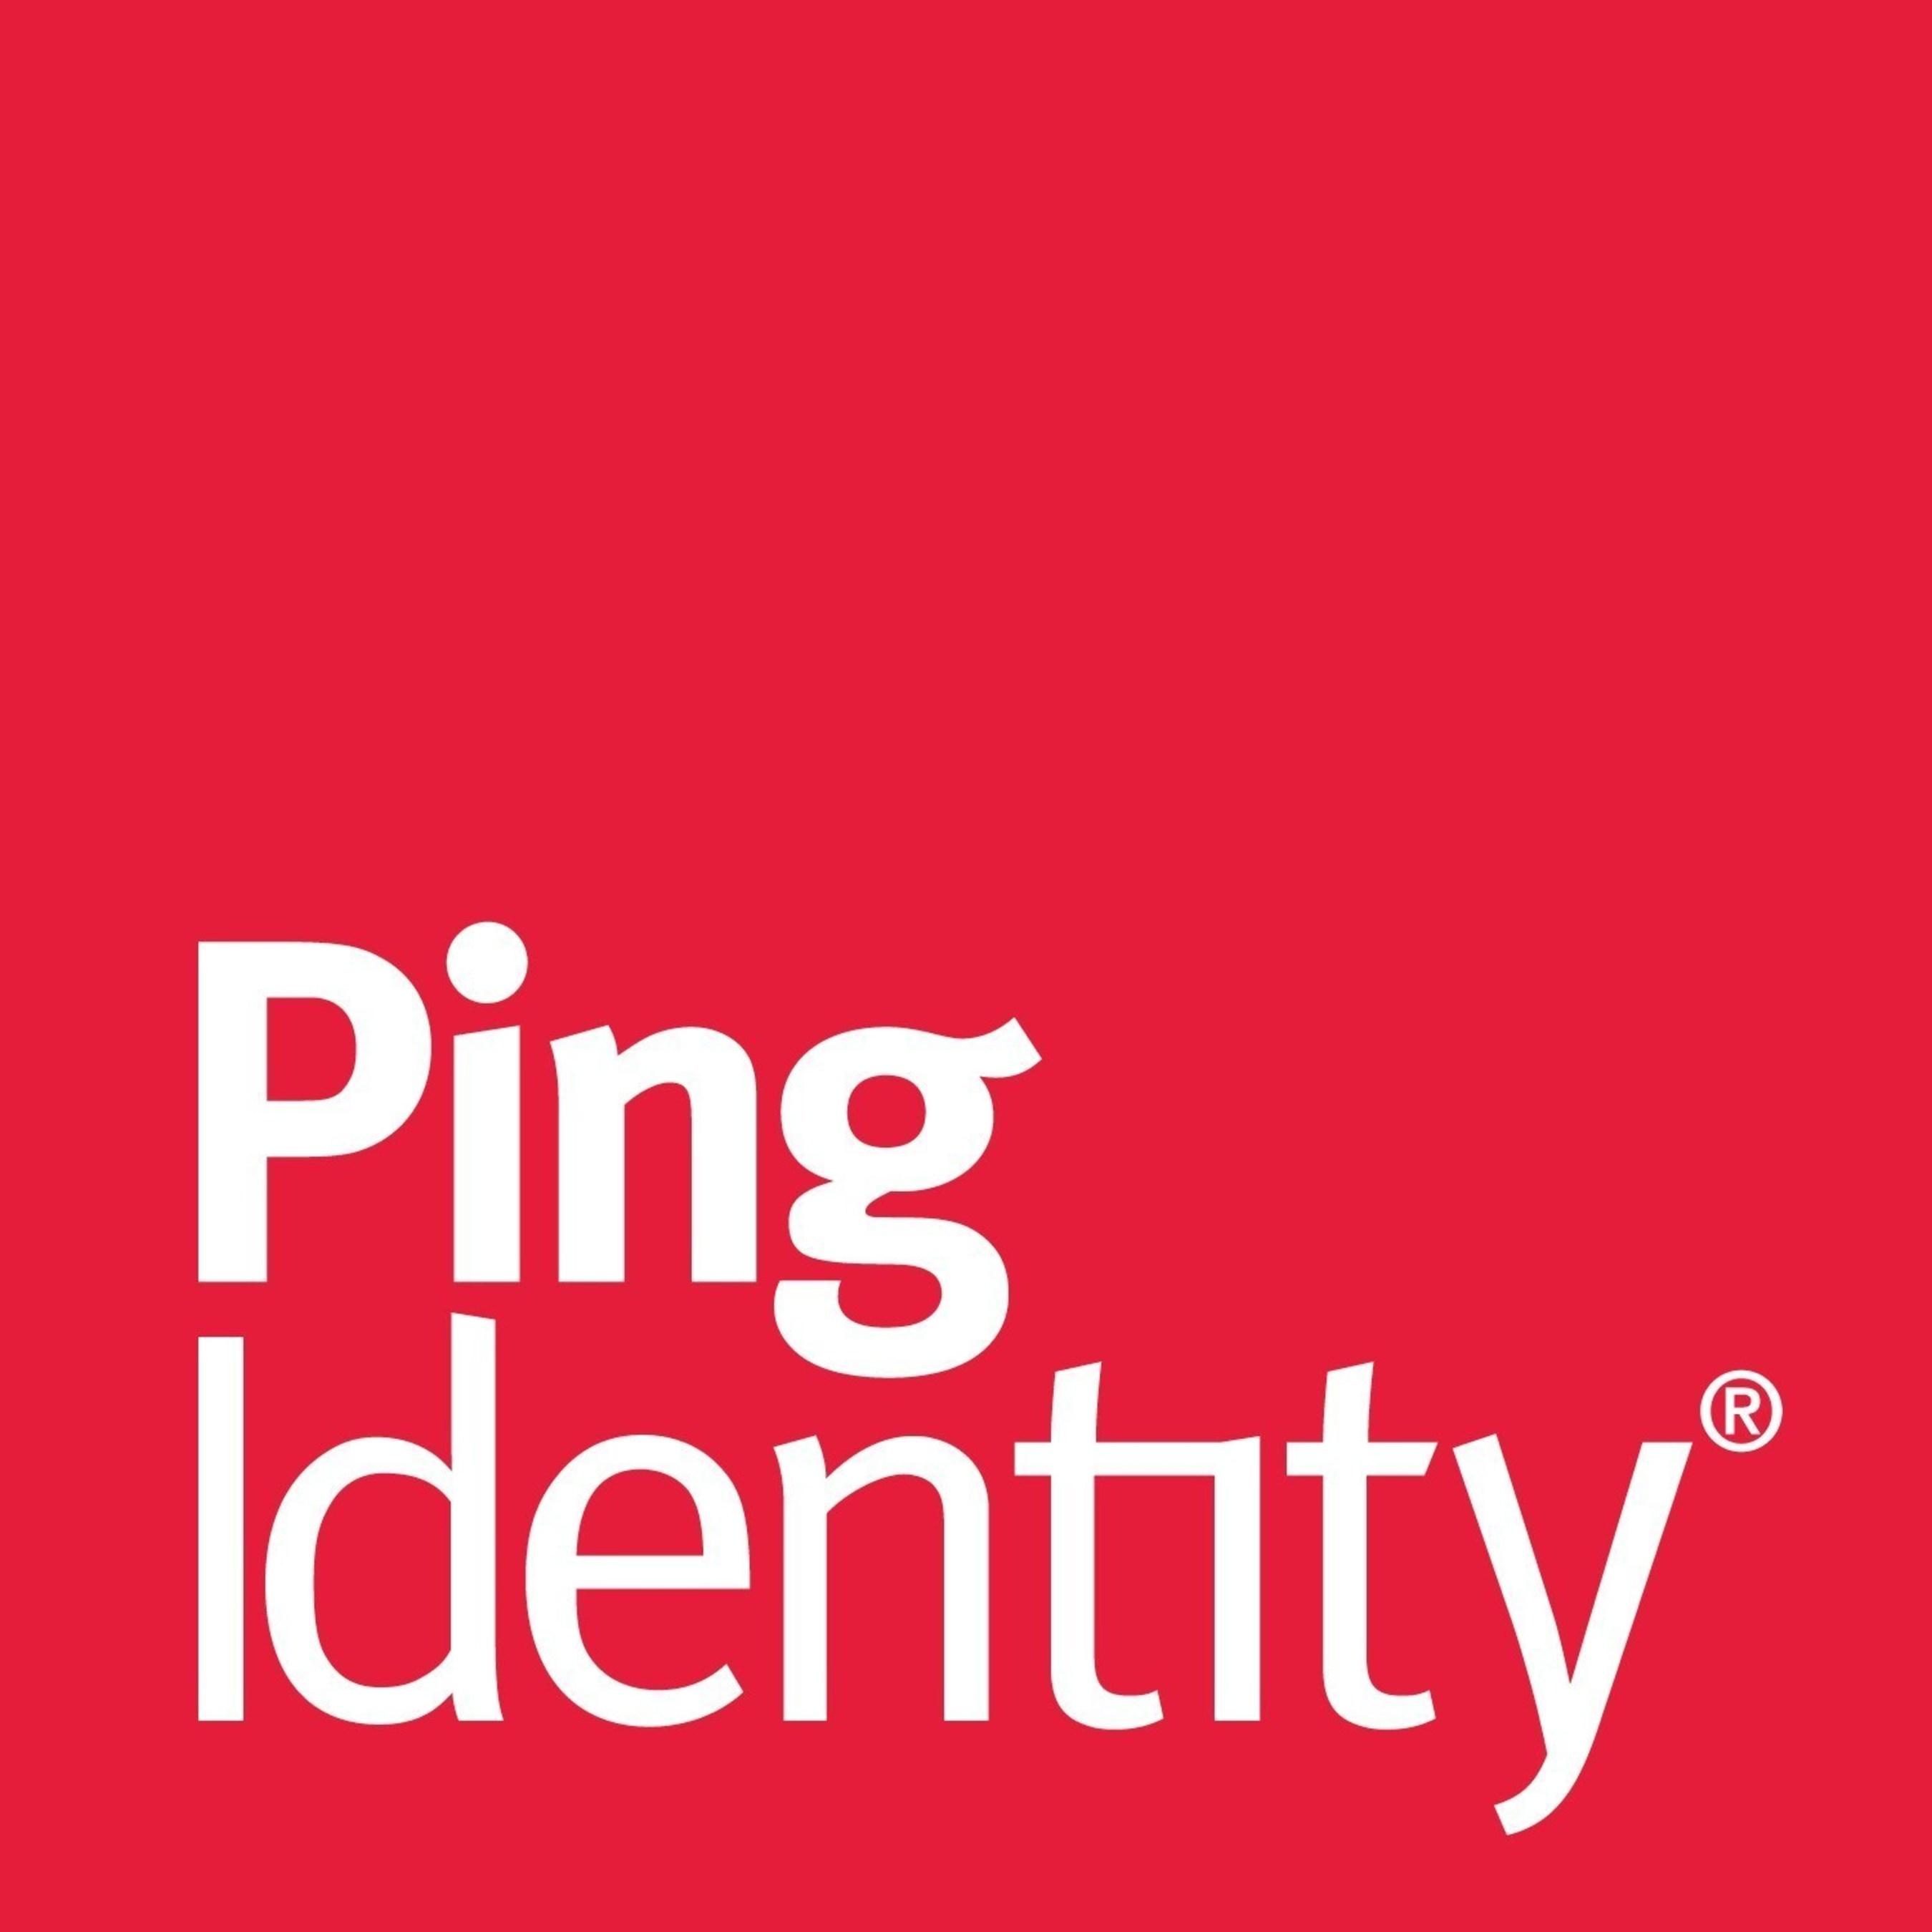 Visionaire experts op het gebied van identiteit van Google, Salesforce.com, Citigroup, Ping